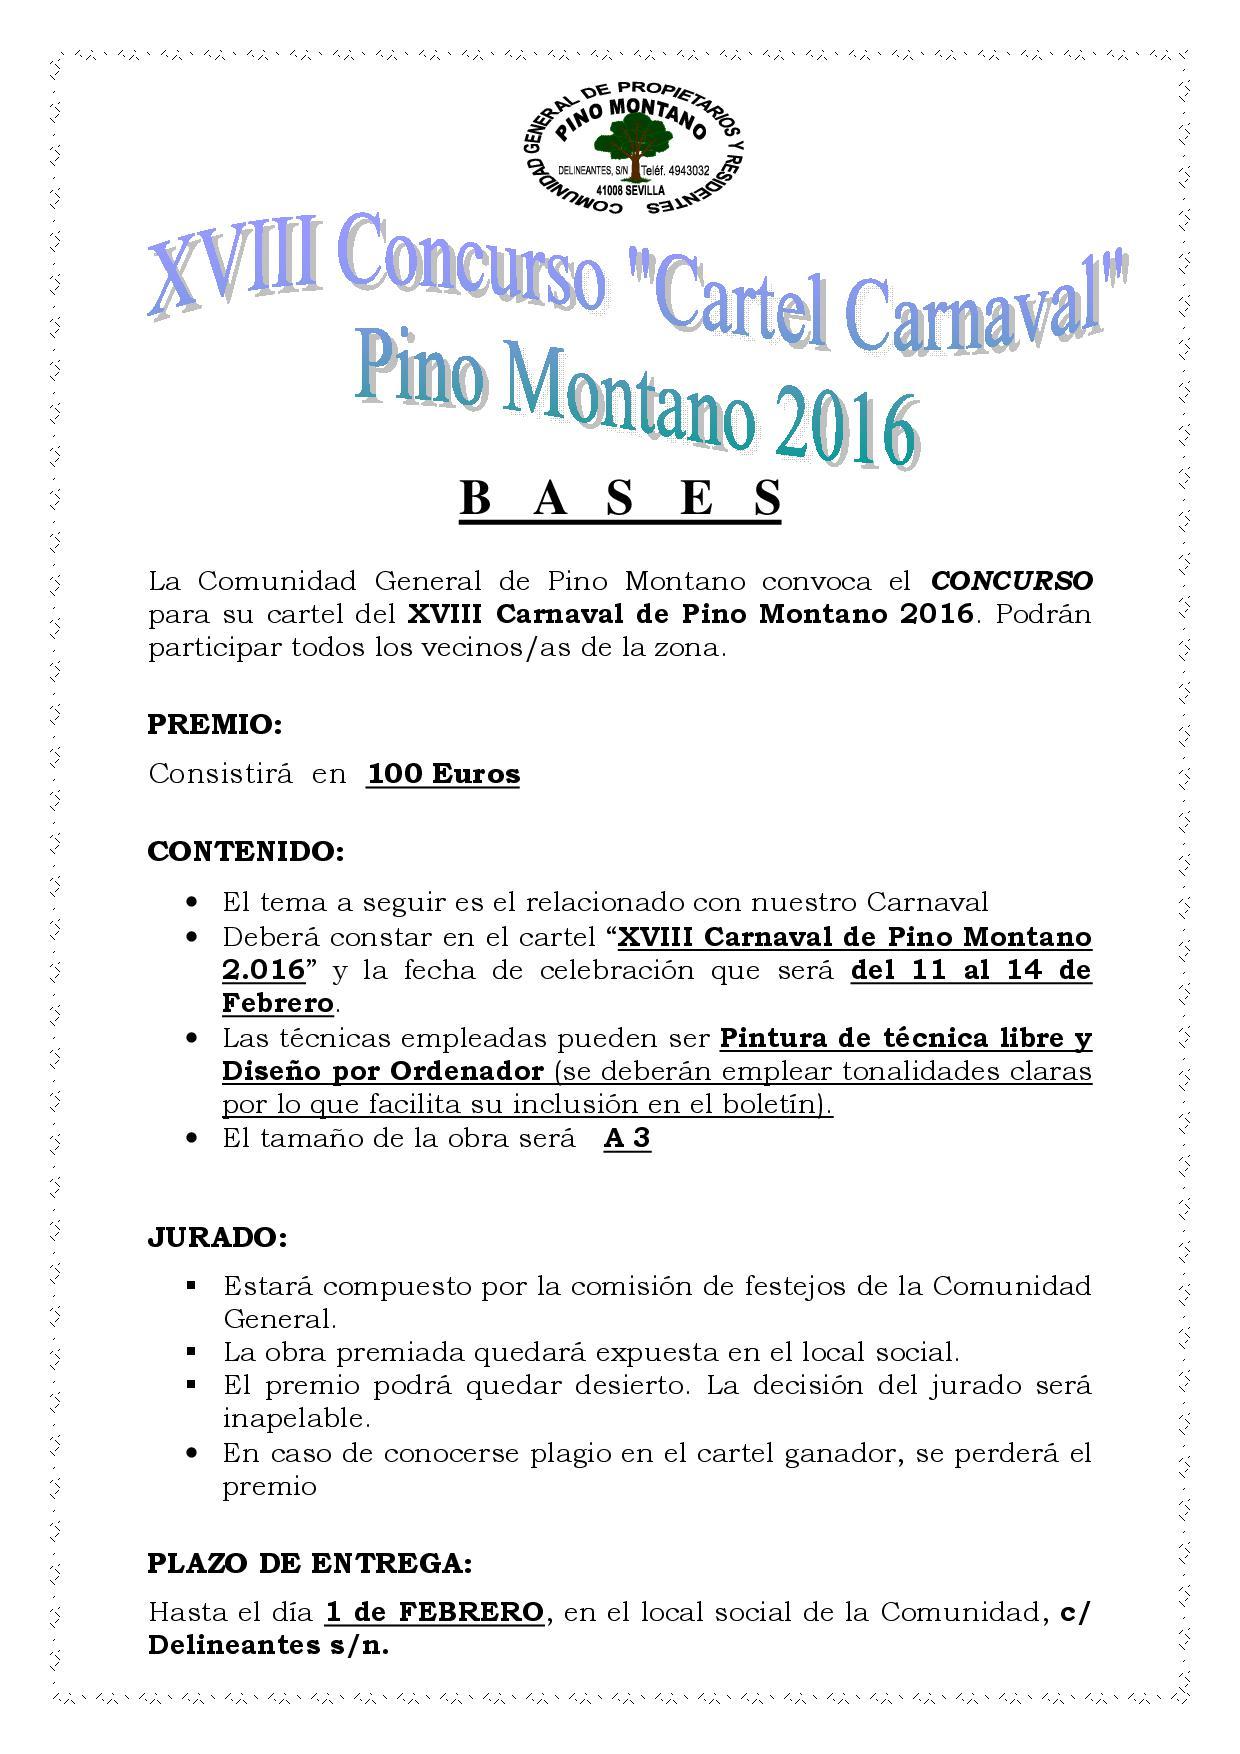 CONCURSO CARTEL XVIII CARNAVAL PINO MONTANO 2016